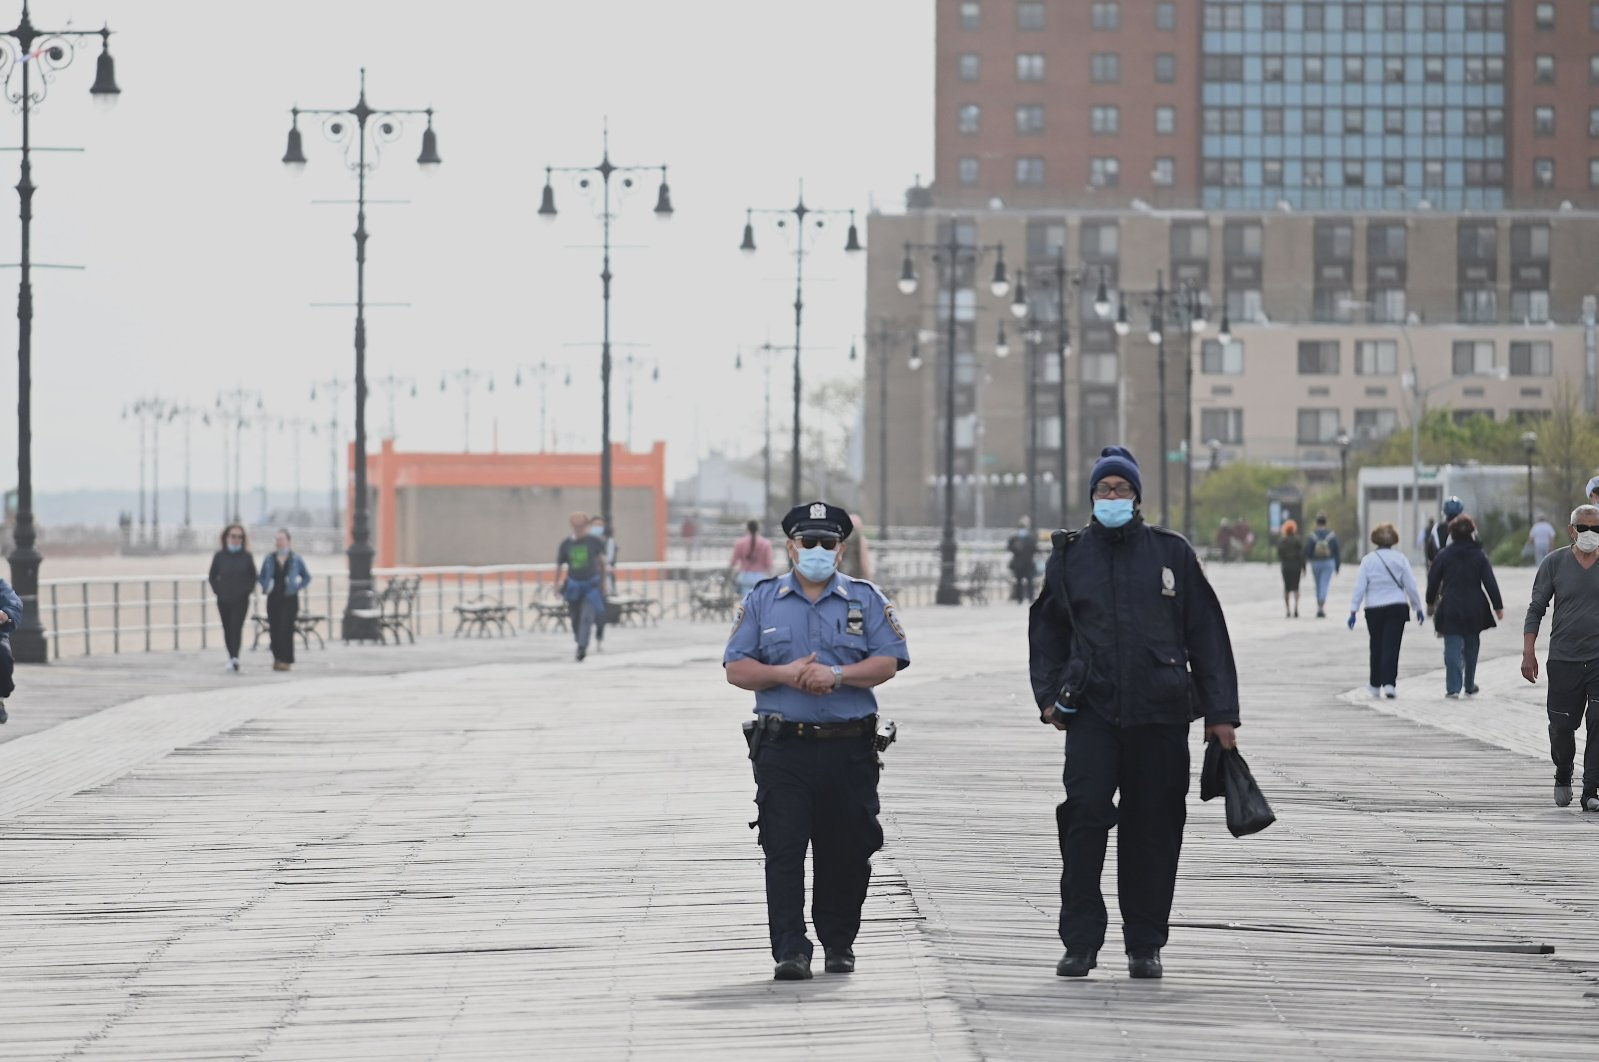 Policemen wearing masks patrol at the promenade at Coney Island Beach on May 18, 2020 in New York City. (AFP Photo)